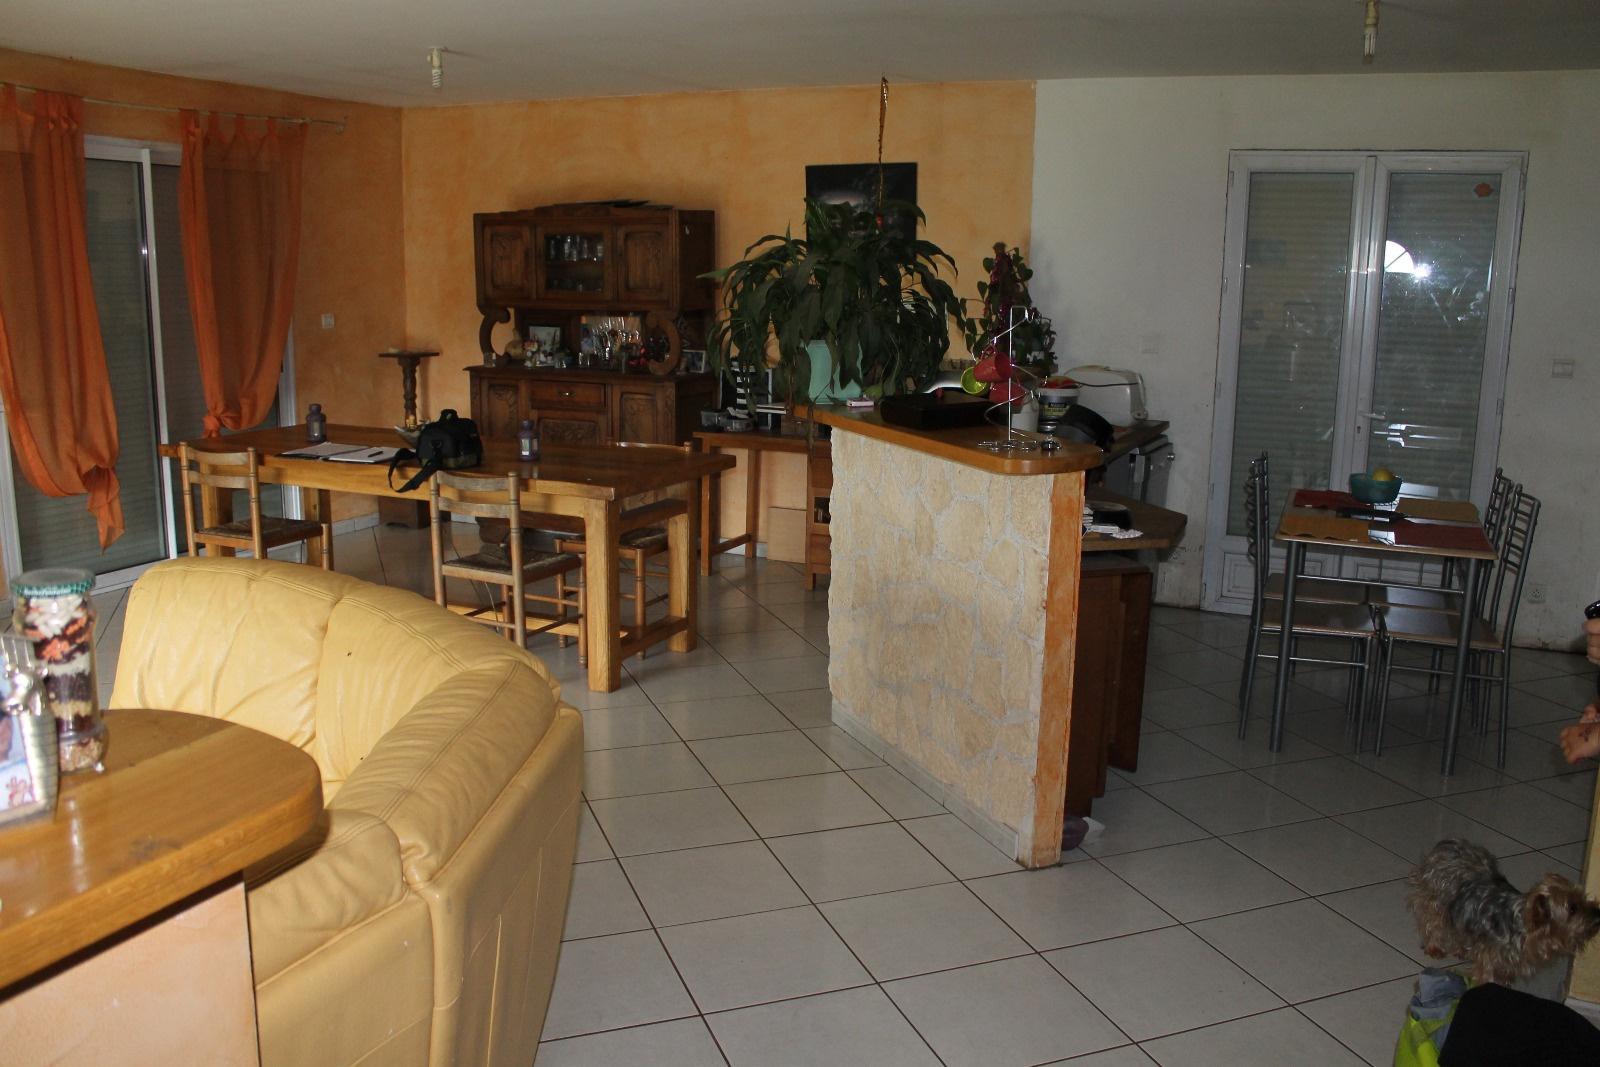 Vente maison individuelle r cente for Garage ad aurillac